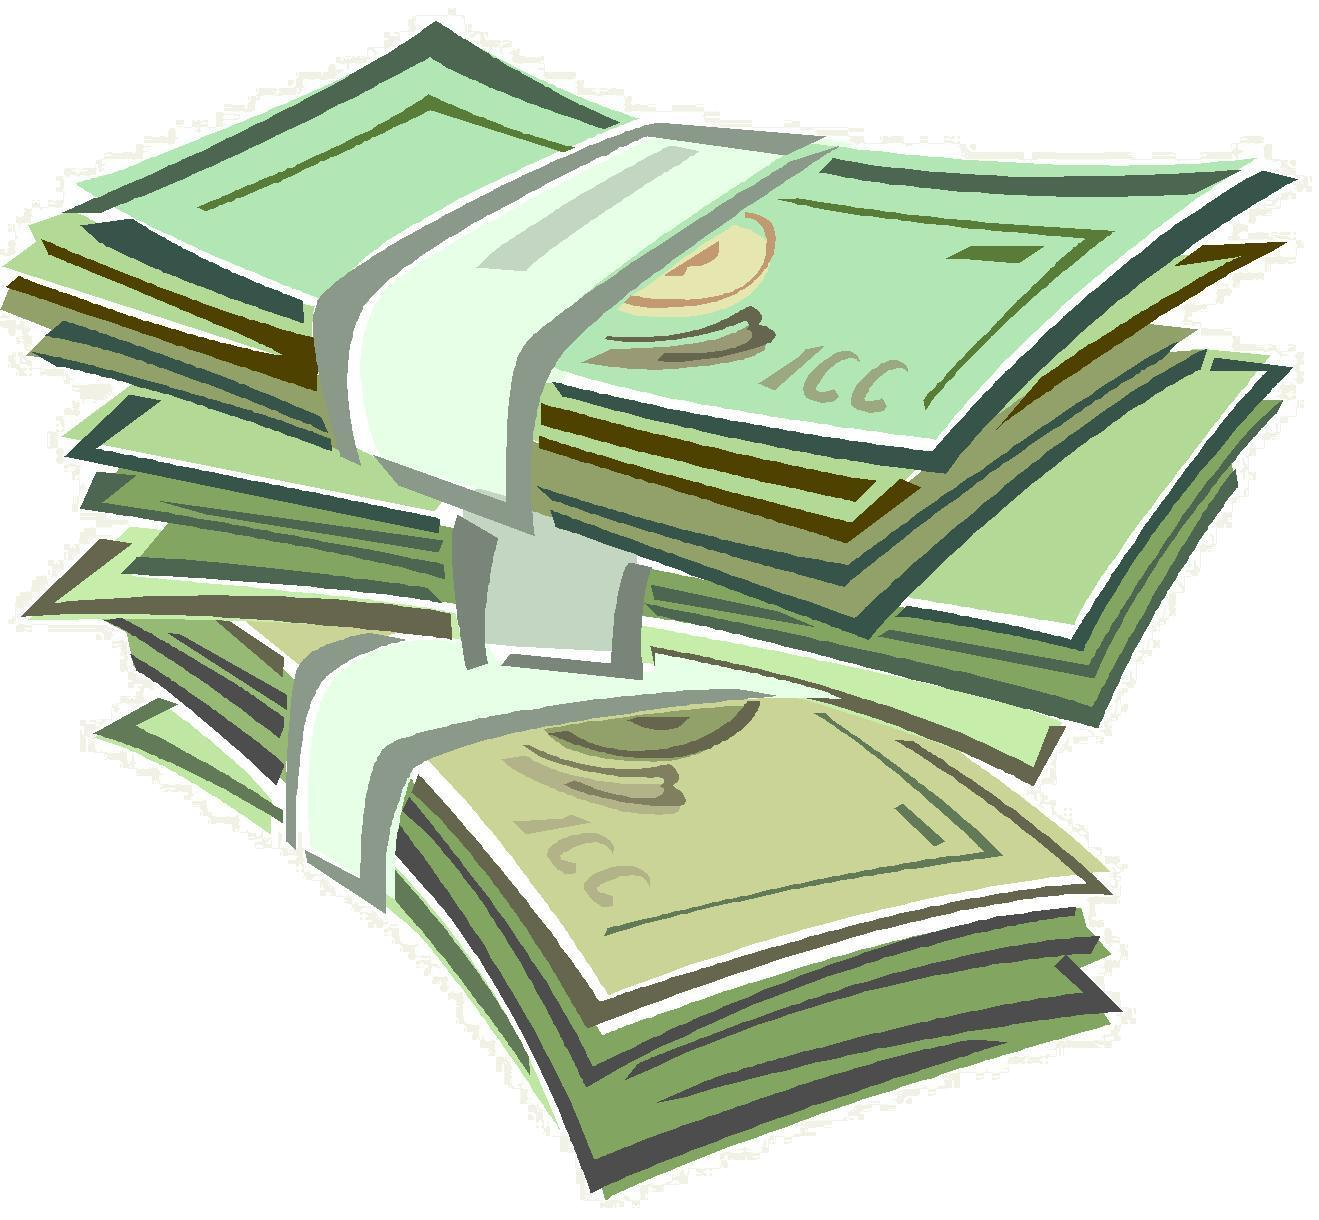 câți bani ai câștigat câștigați bani online în Illustrator